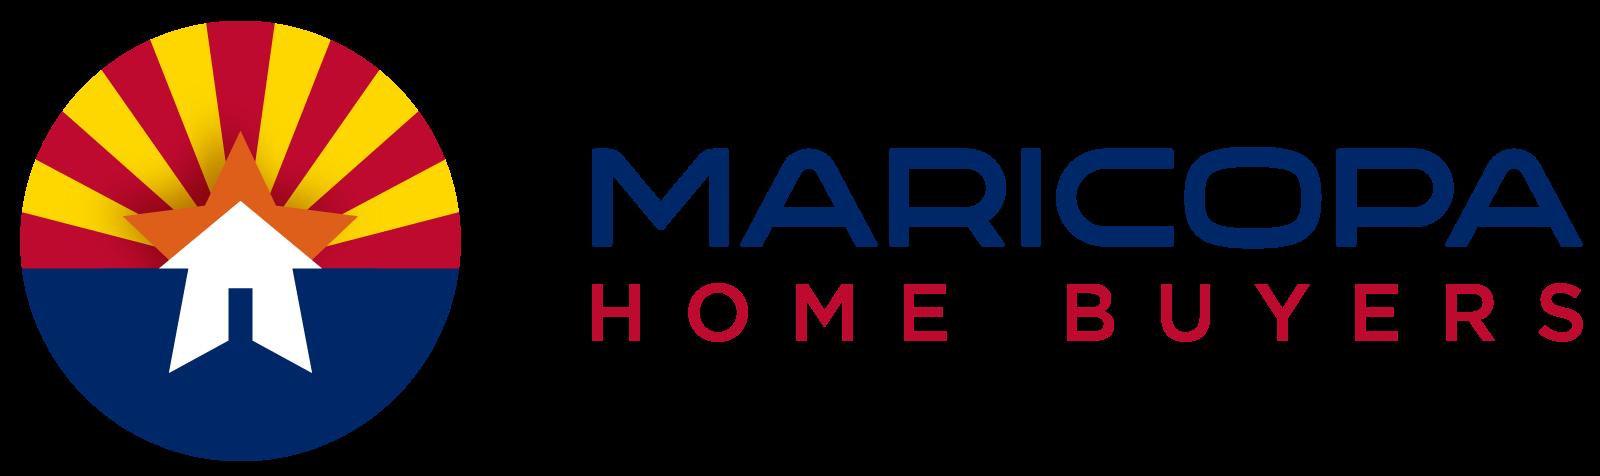 Maricopa Home Buyers, LLC logo